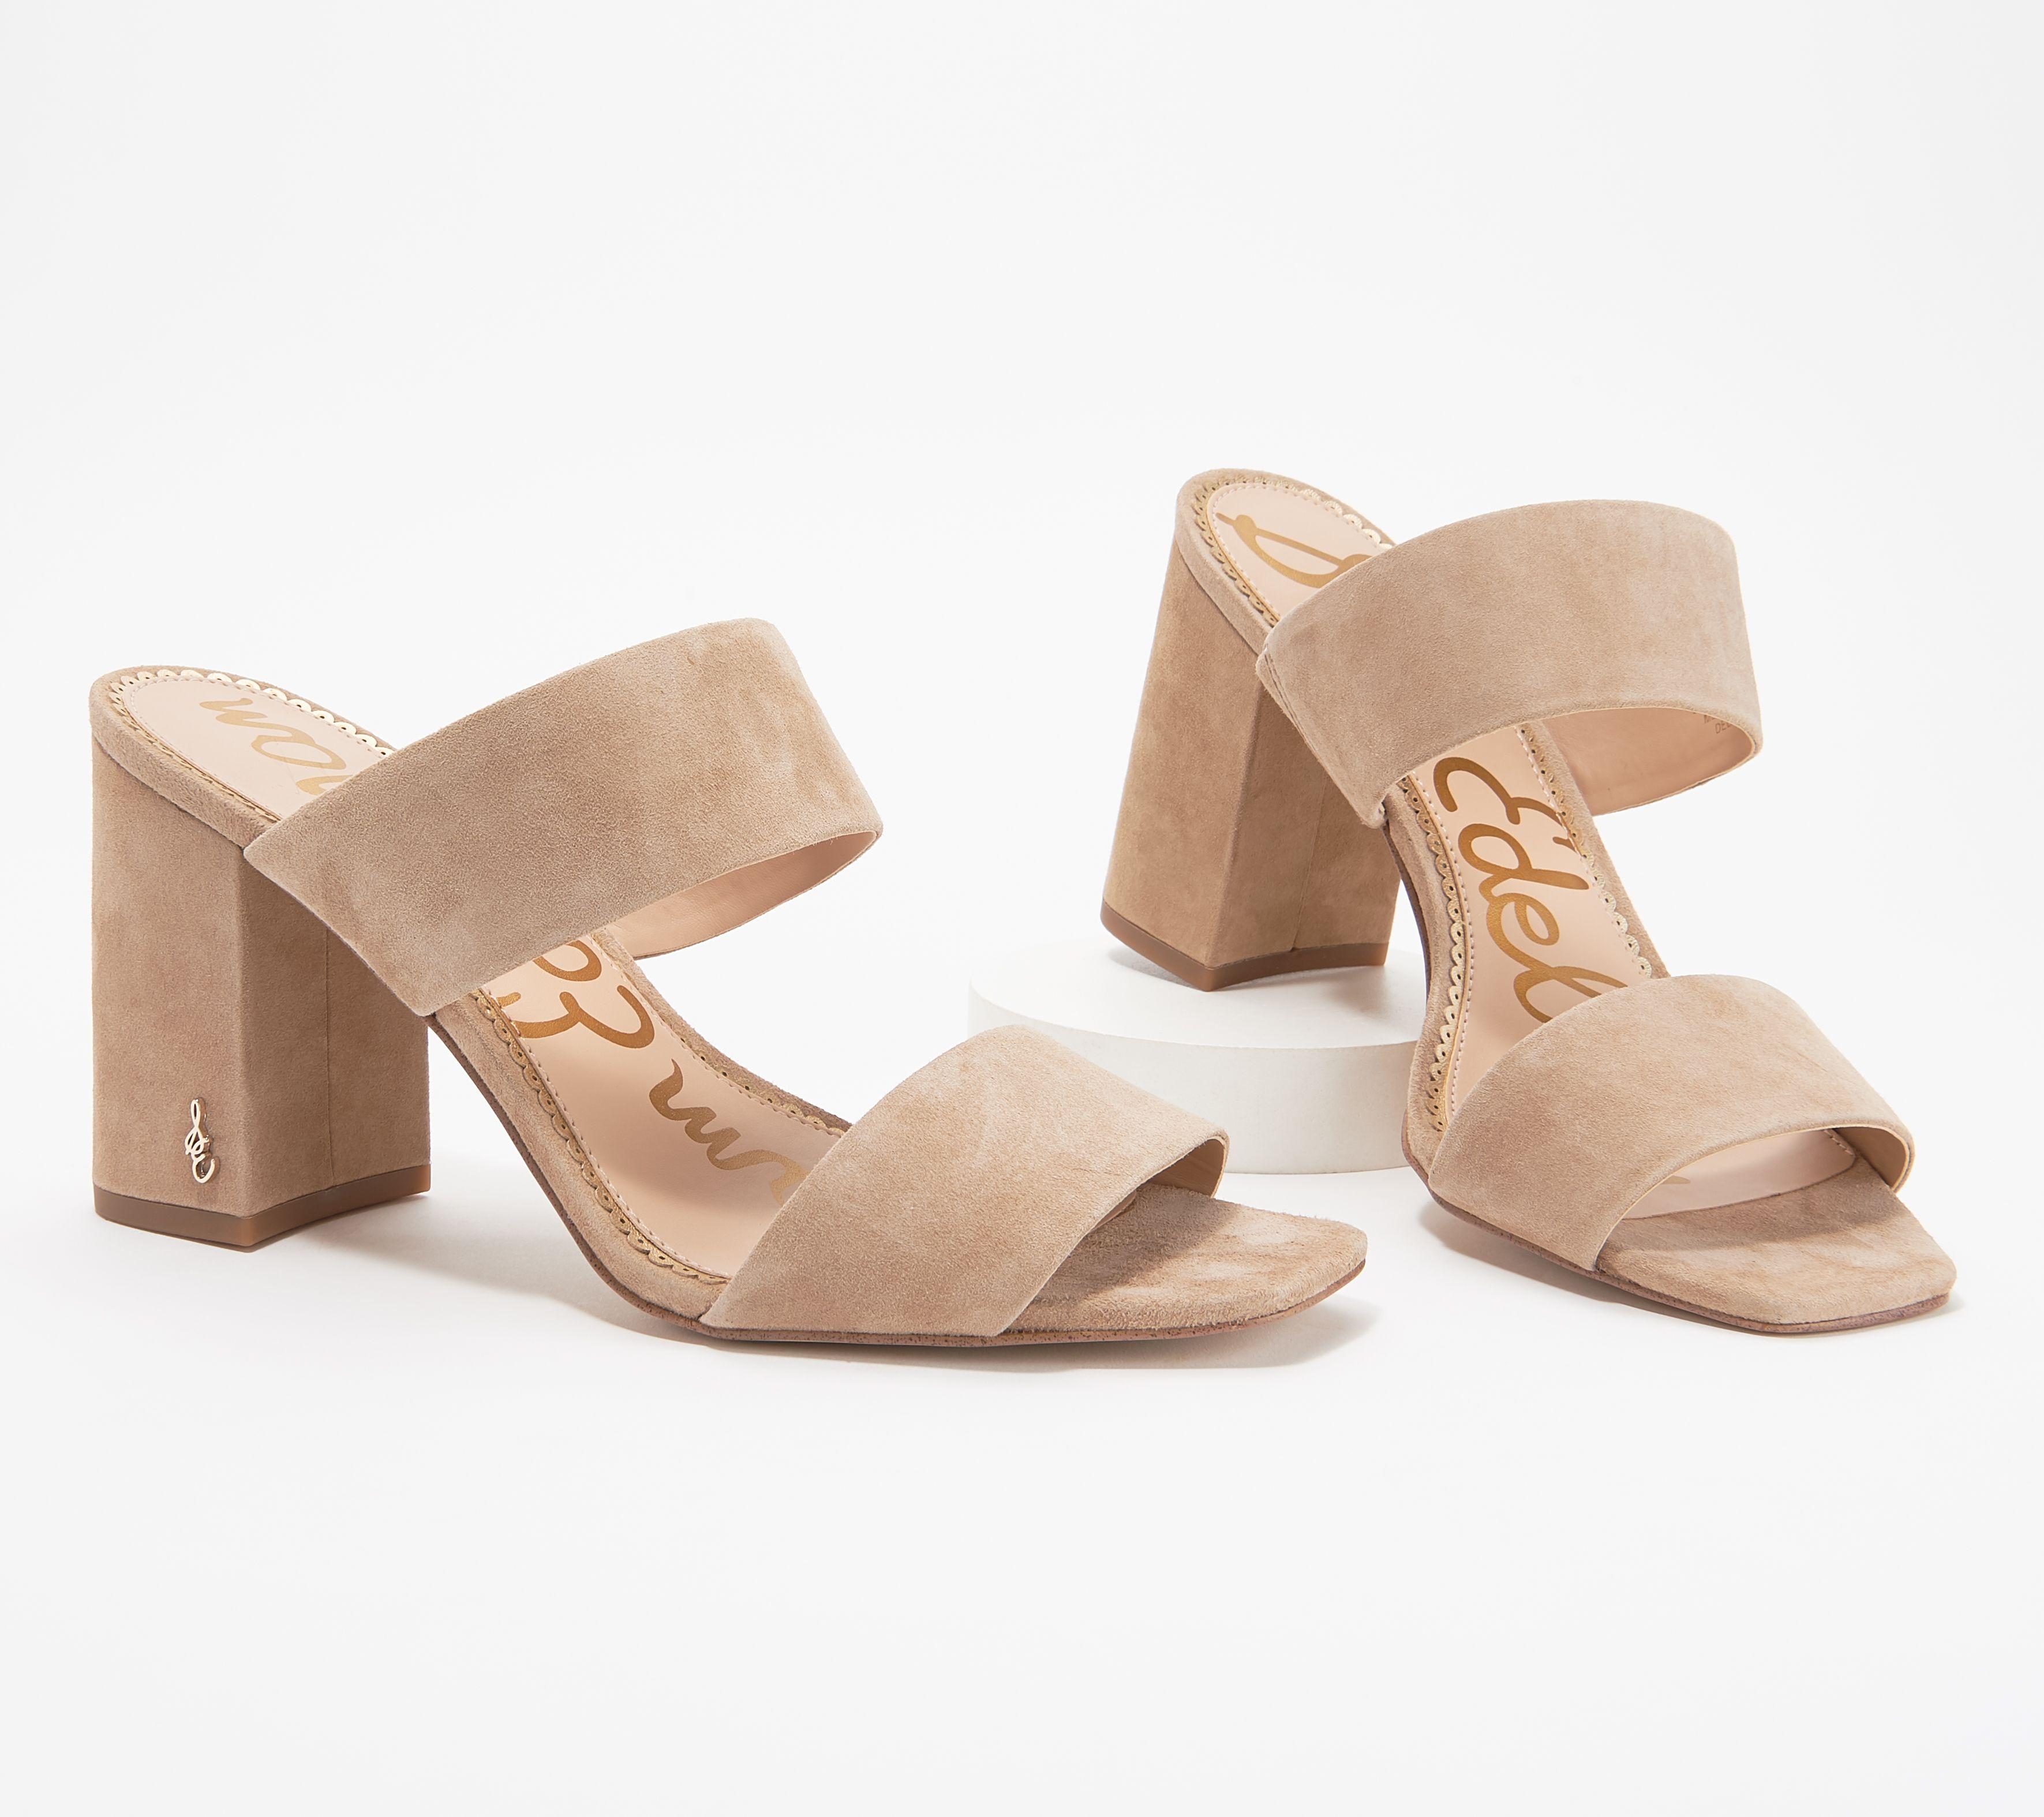 eaf60caa731e Sam Edelman Double Strap Block-Heeled Sandals - Delaney — QVC.com